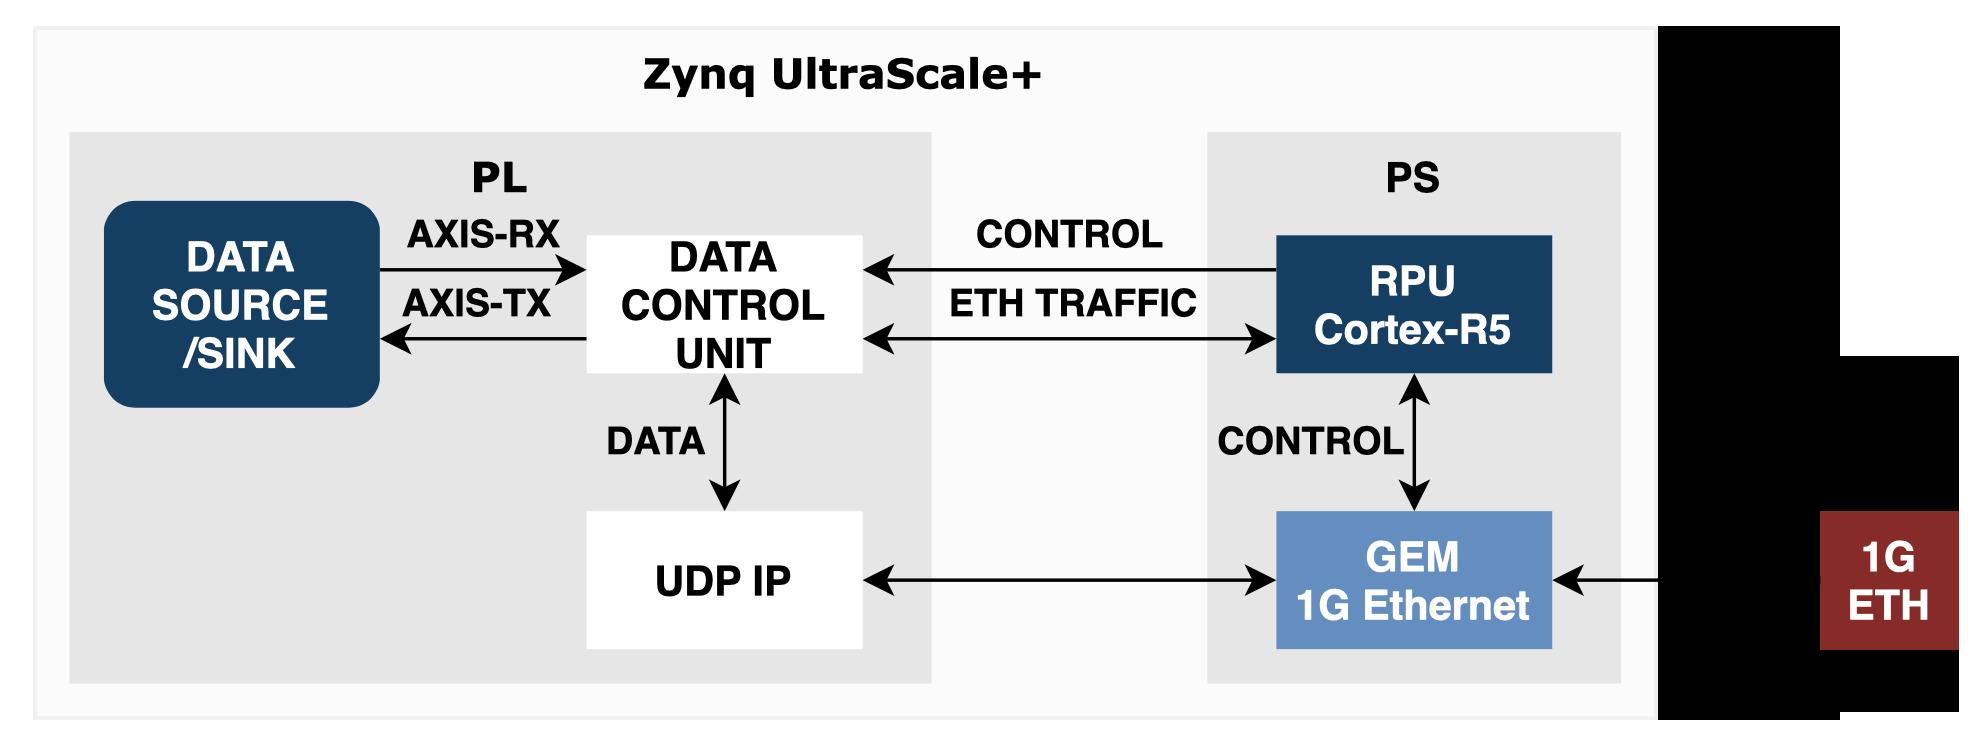 zynqus+ networking 1G rpu cortex-r5 udp